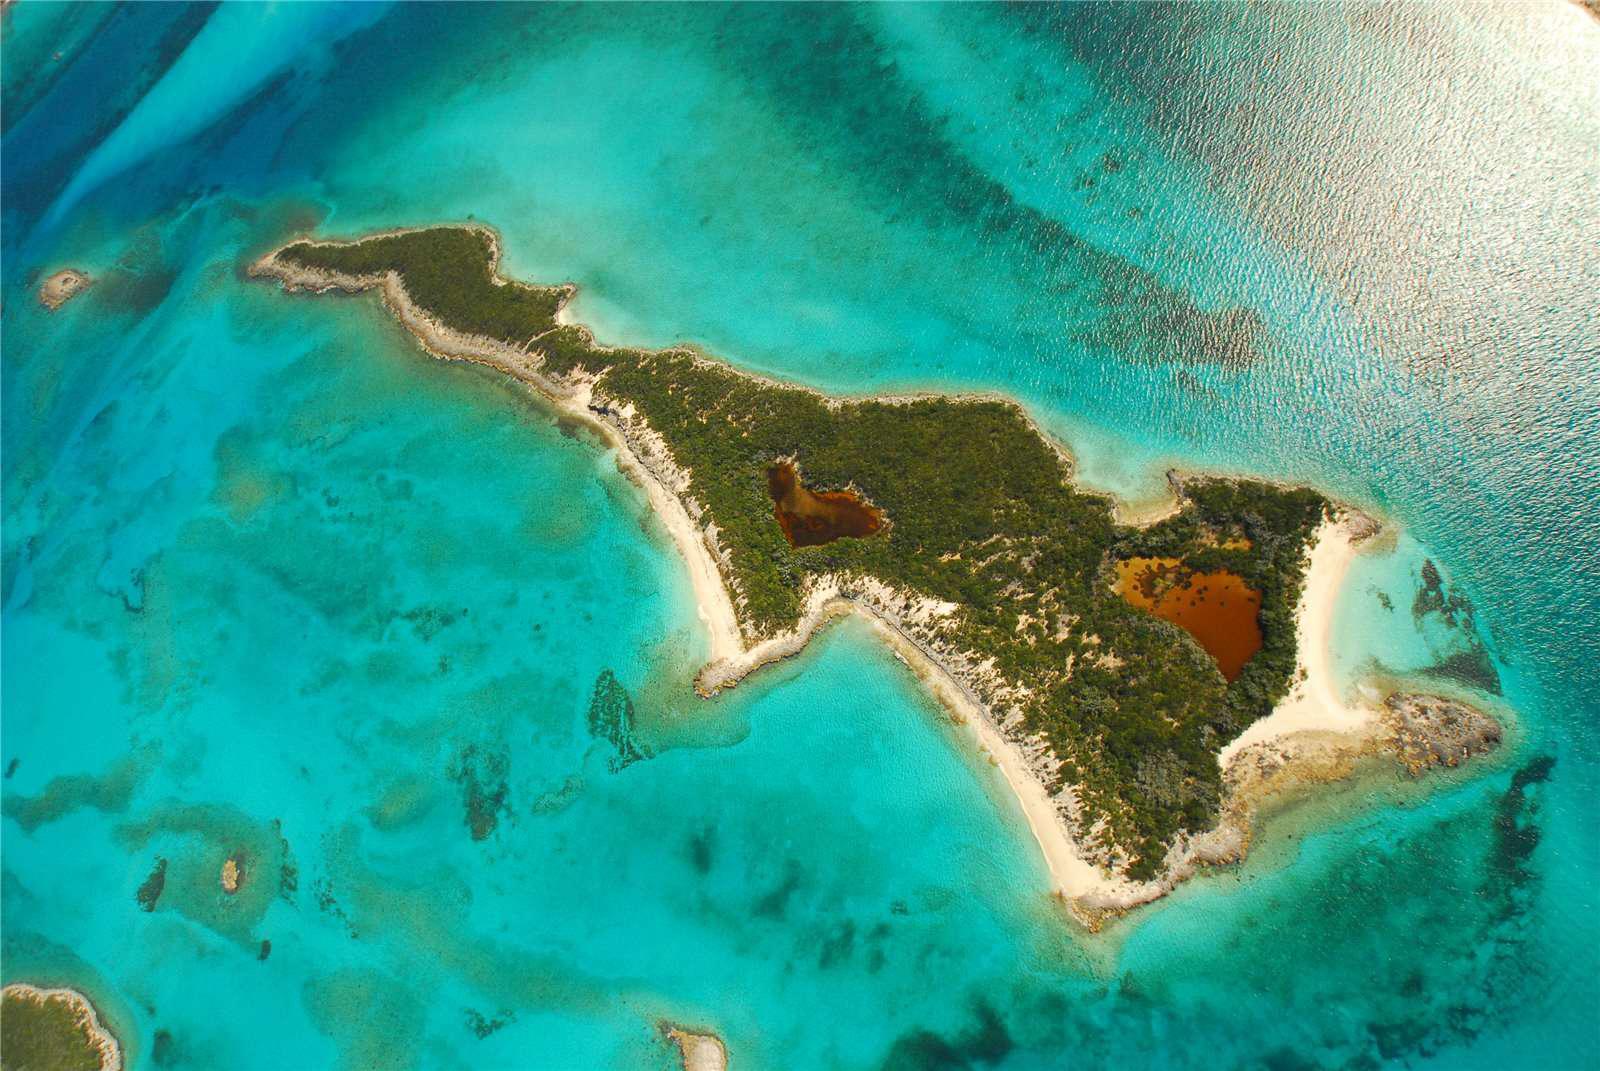 Leaf Cay in Exuma Cays, Bahamas